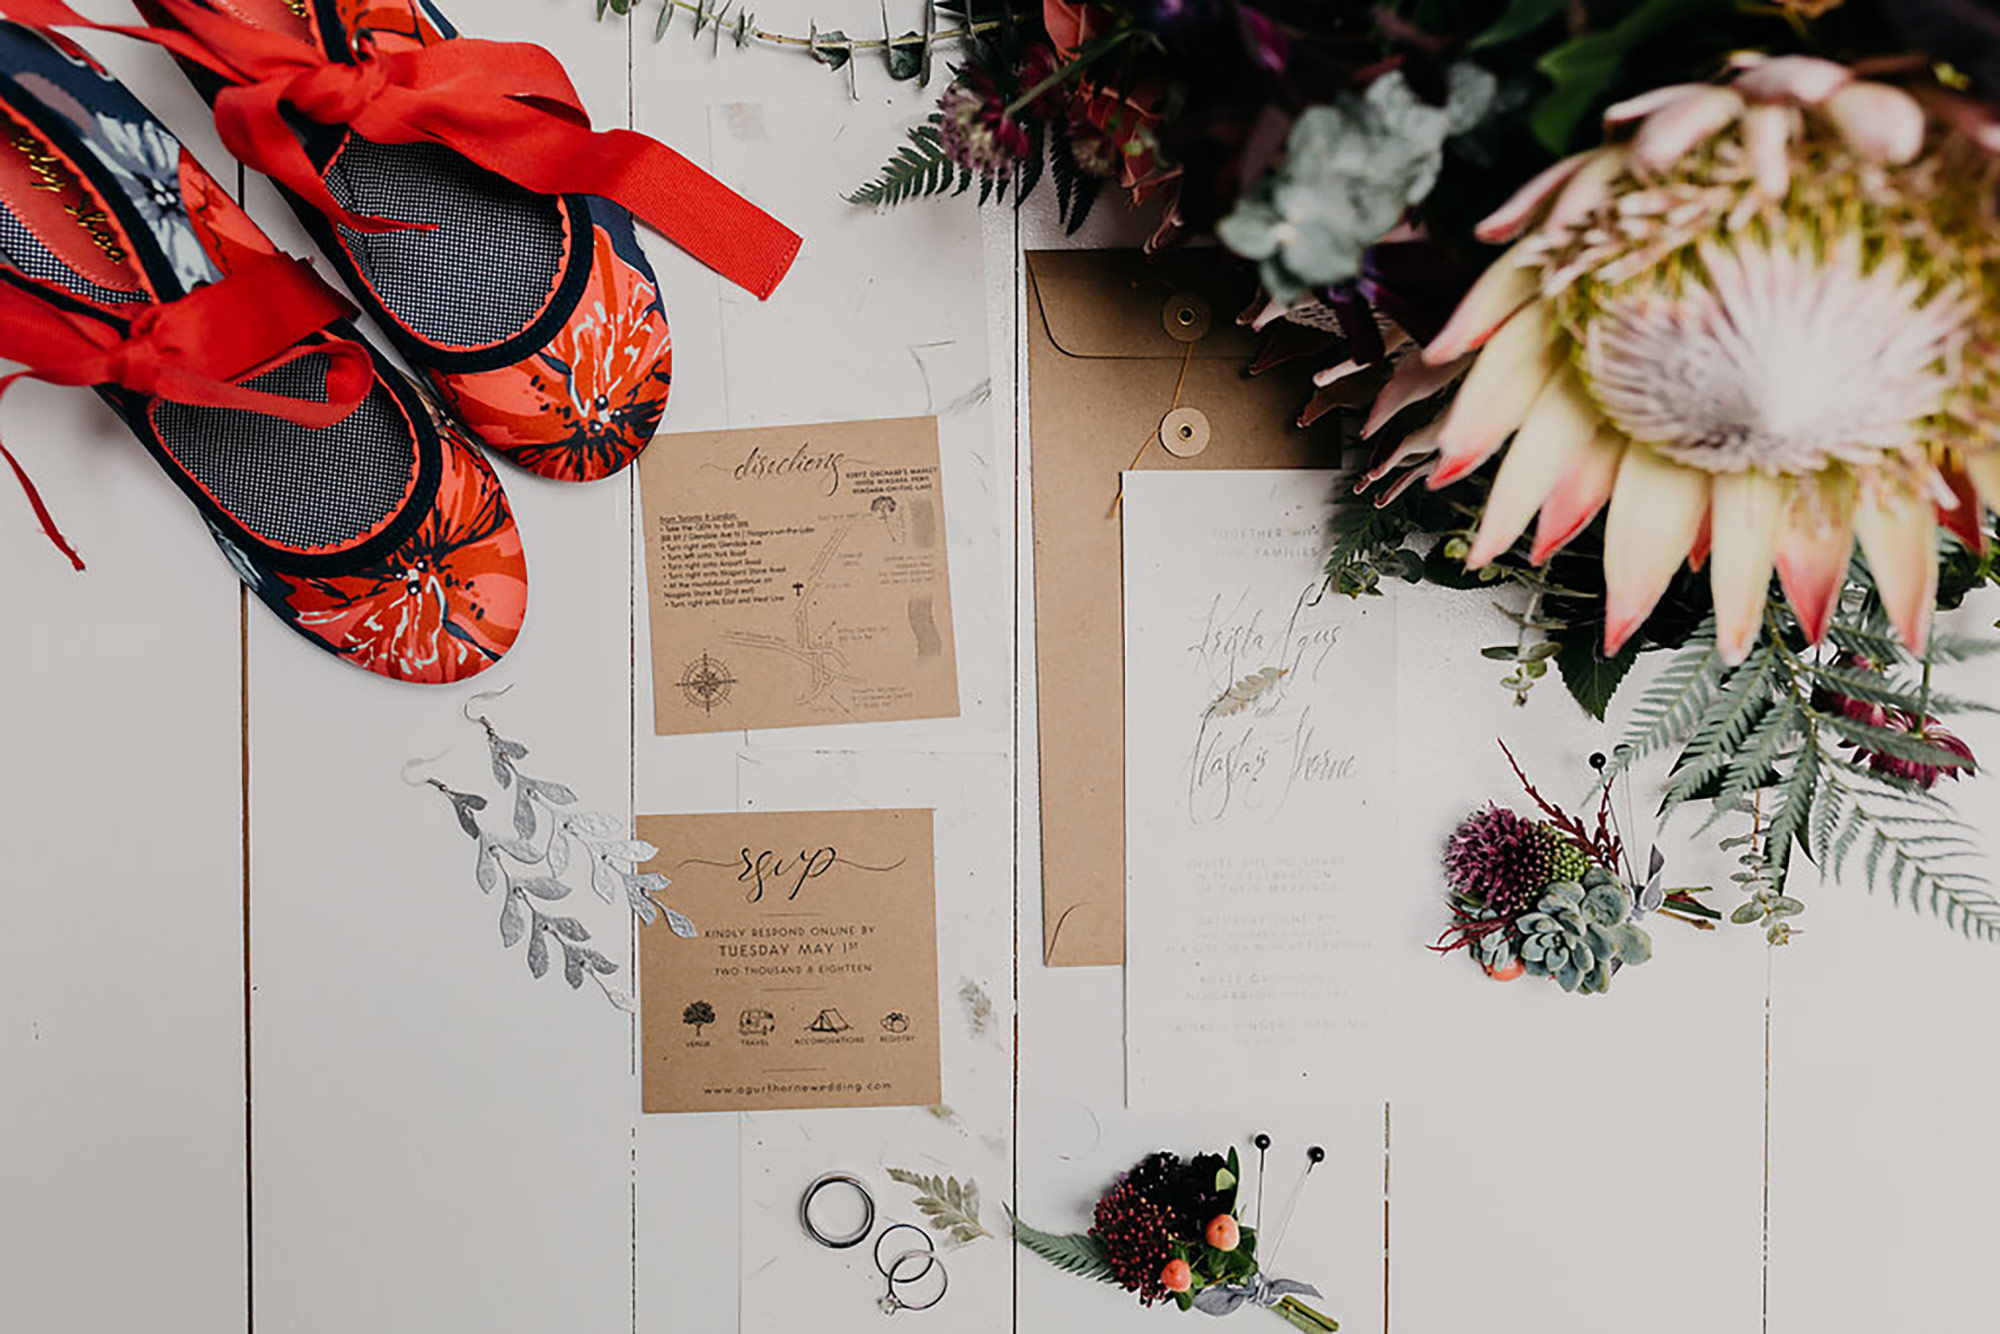 Kurtz-Orchards-Wedding-Niagara-wedding-Vineyard-Bride-Photography-by-Kayla-Rocca-001.JPG